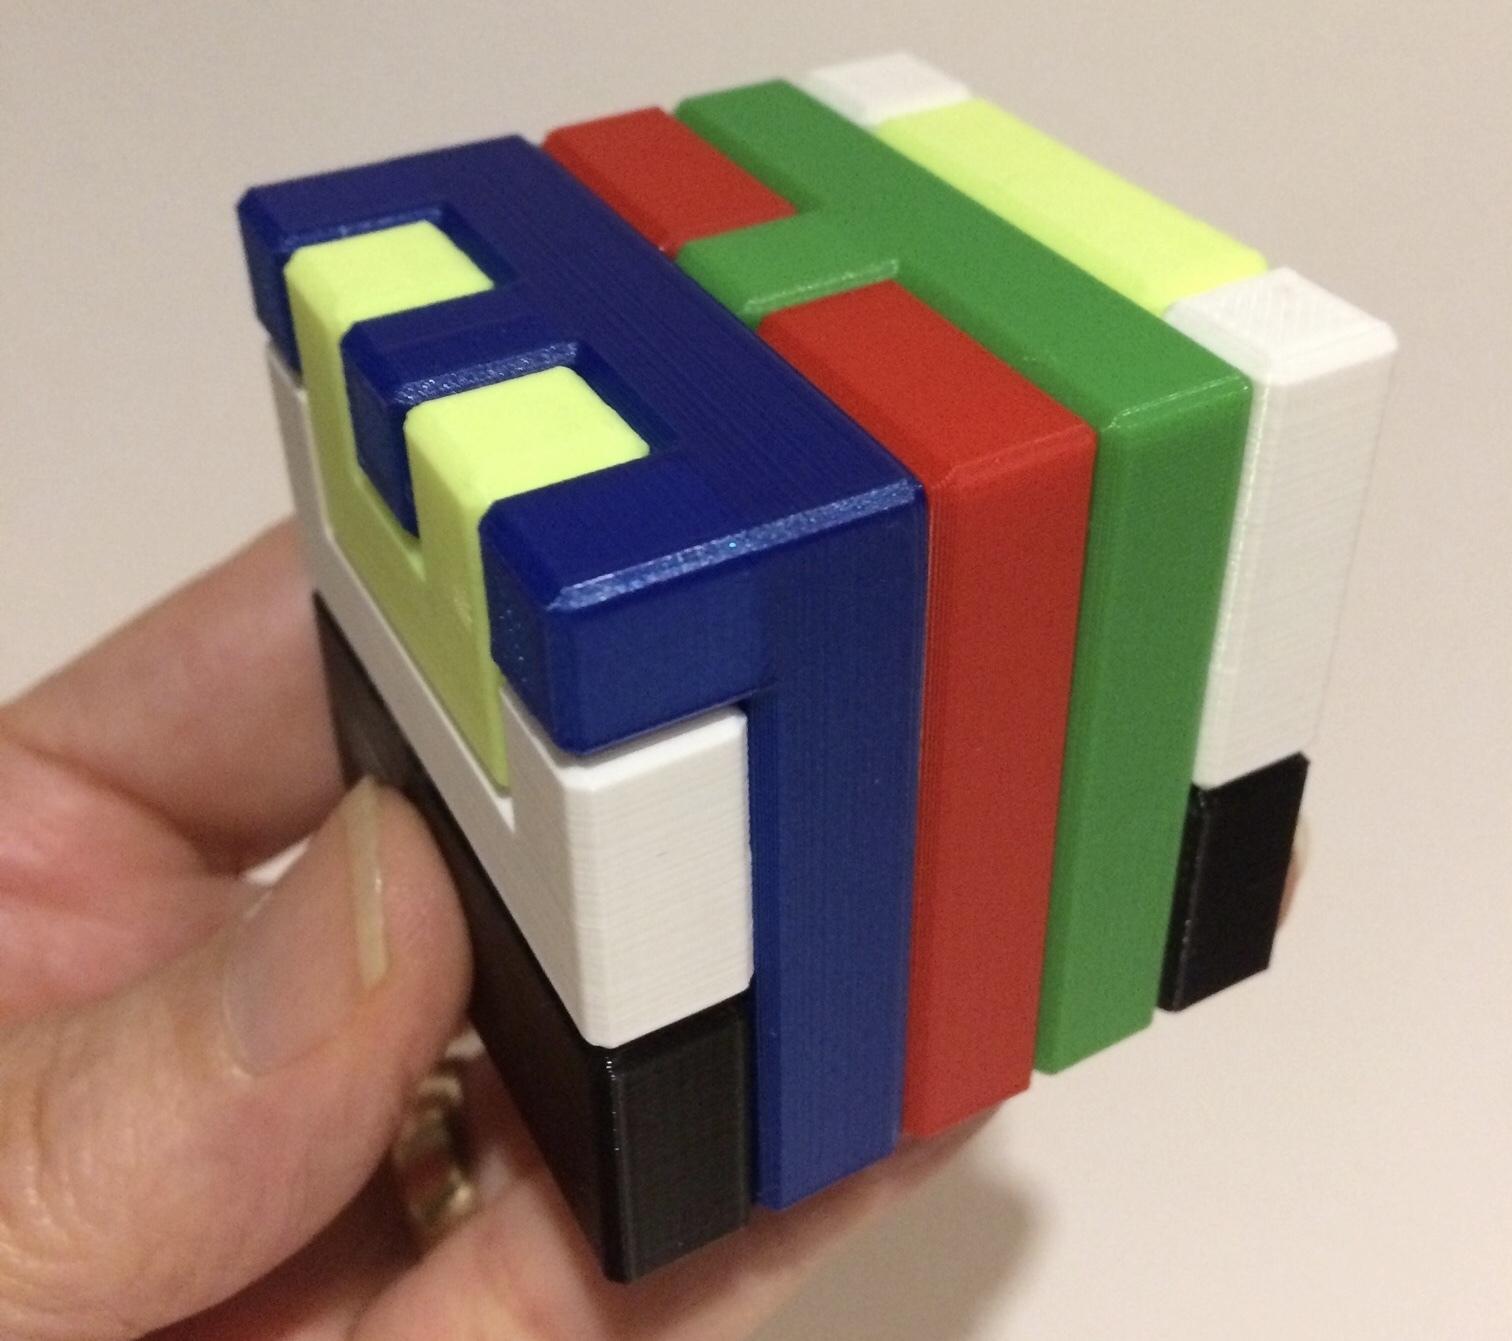 3D Printed Printable Interlocking Puzzle #4 - Level 11Richgain - Printable 3D Puzzles